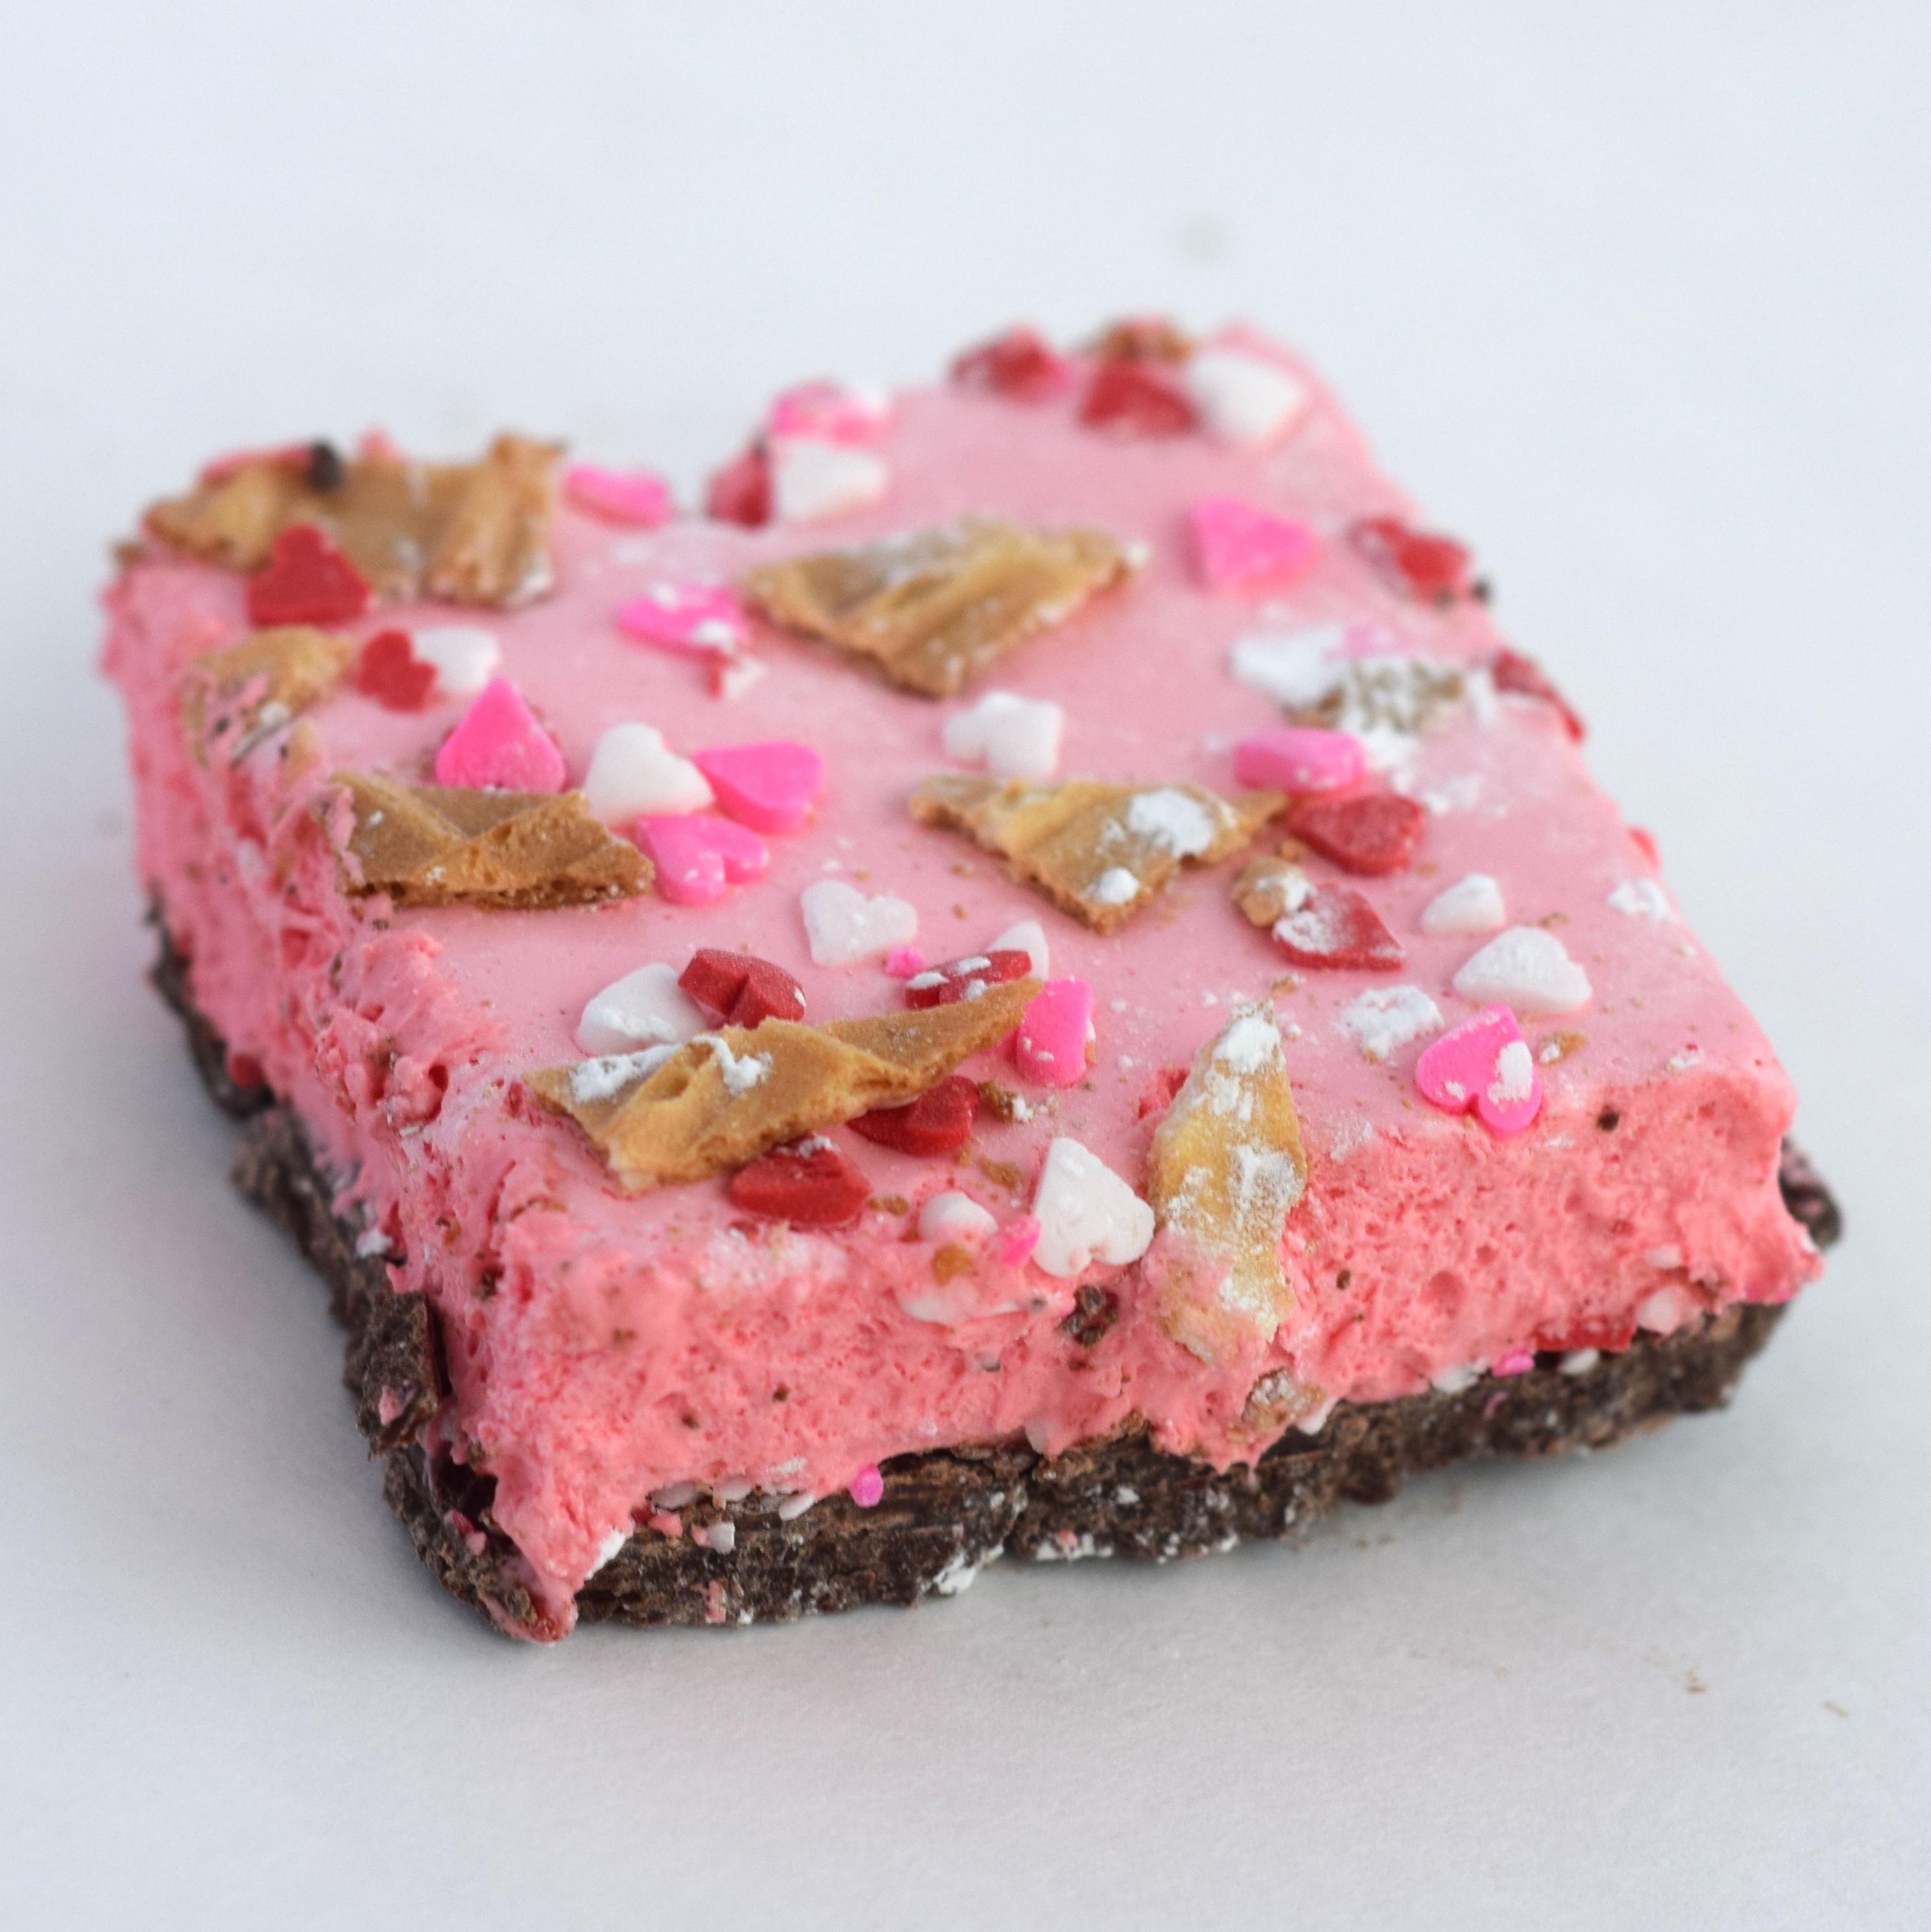 Raspberry Marshmallow Homemade Delicious Recipe